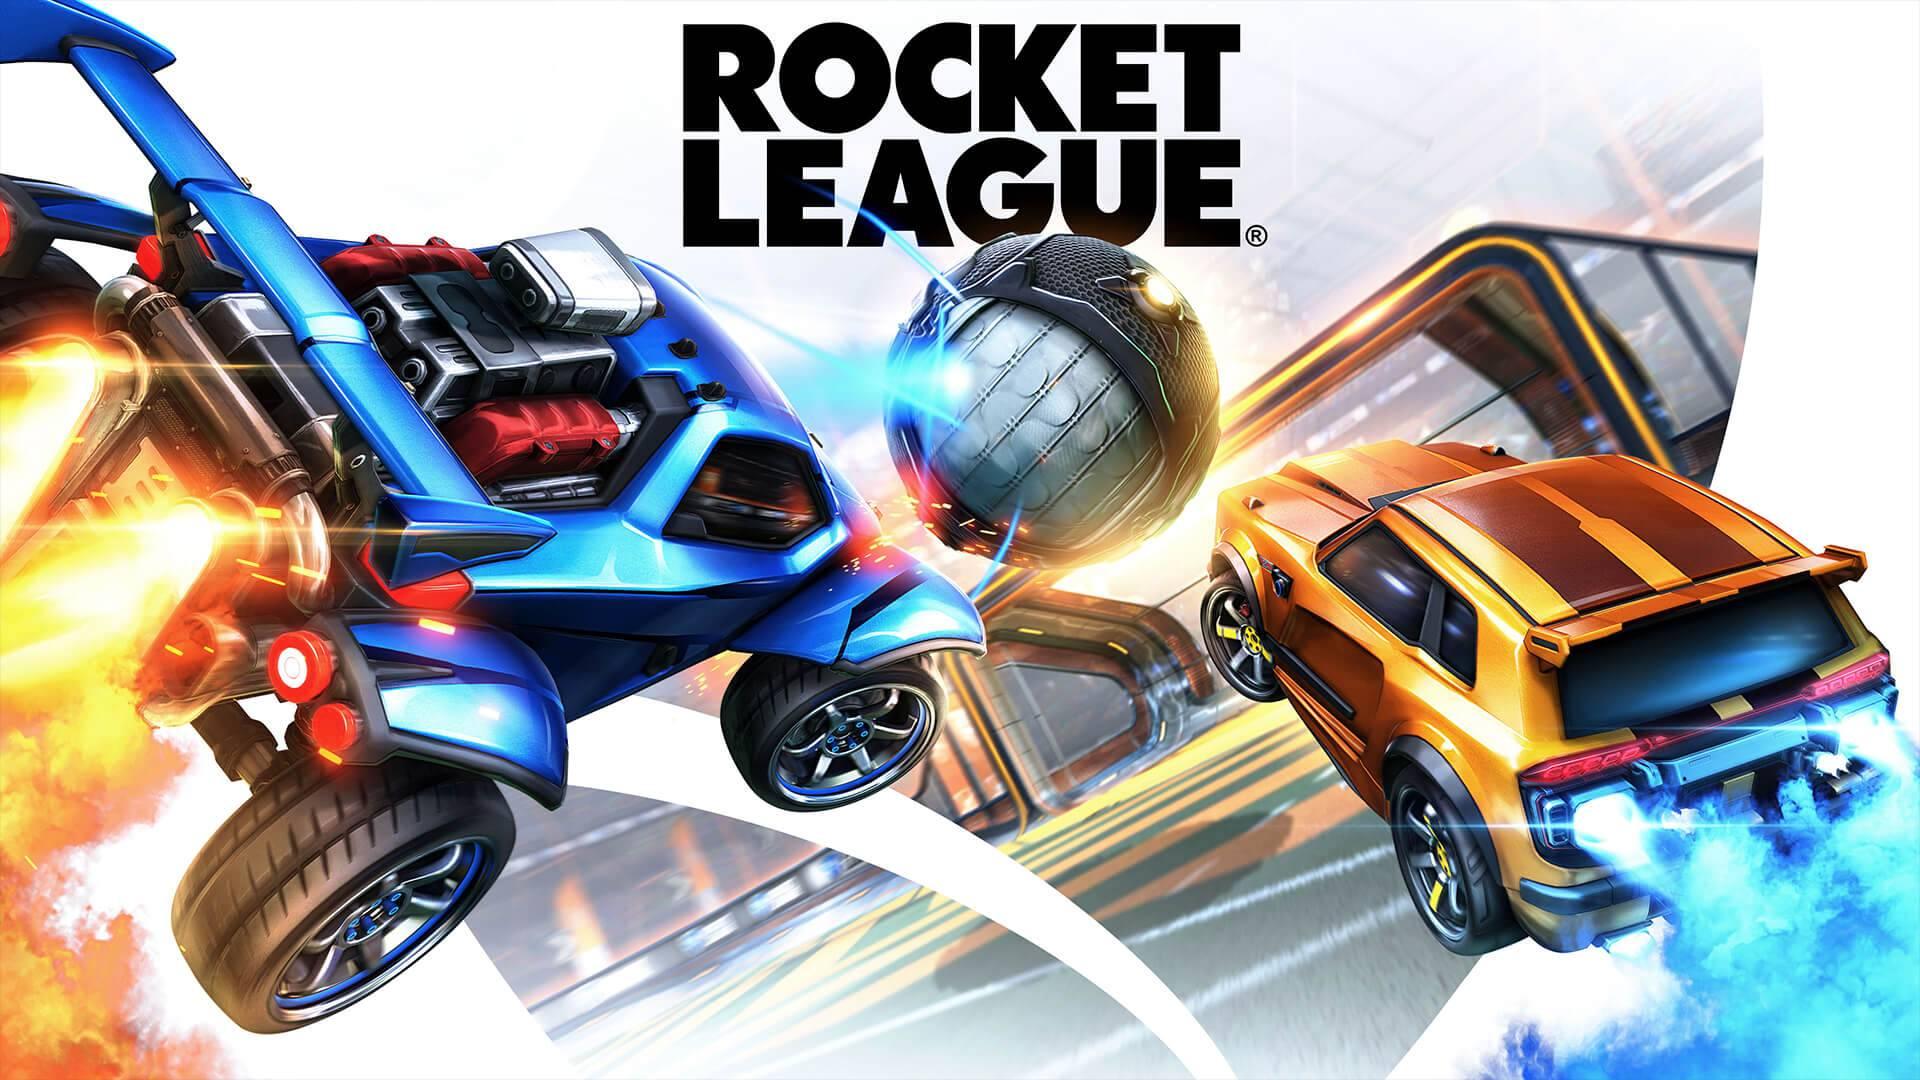 egs social rocketleague news 1920x1080 1920x1080 975383433